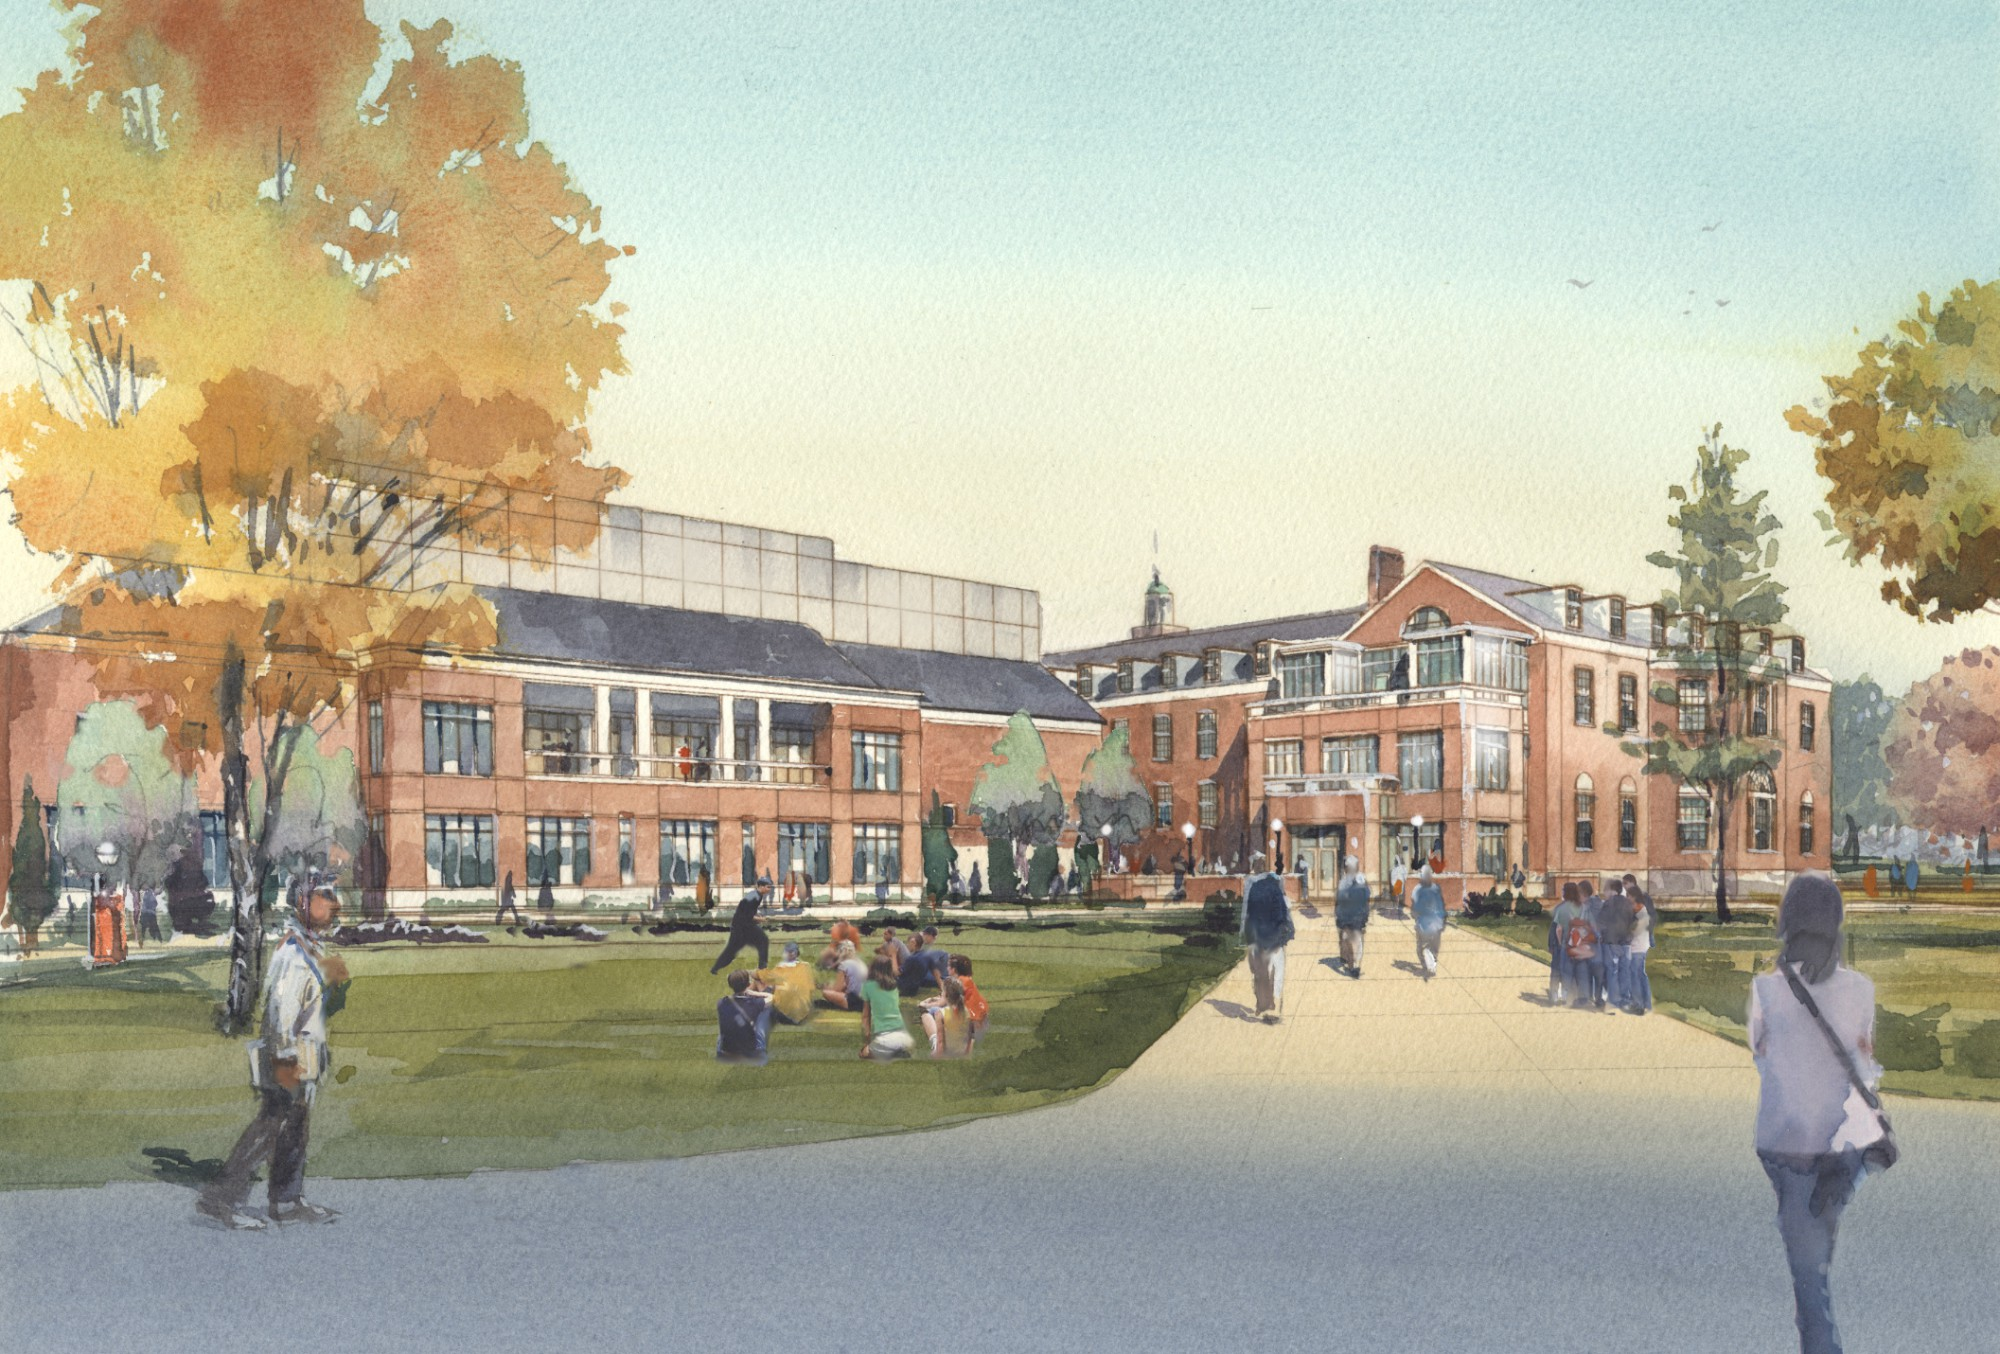 The Mcdonogh School The Burck Center Renovation